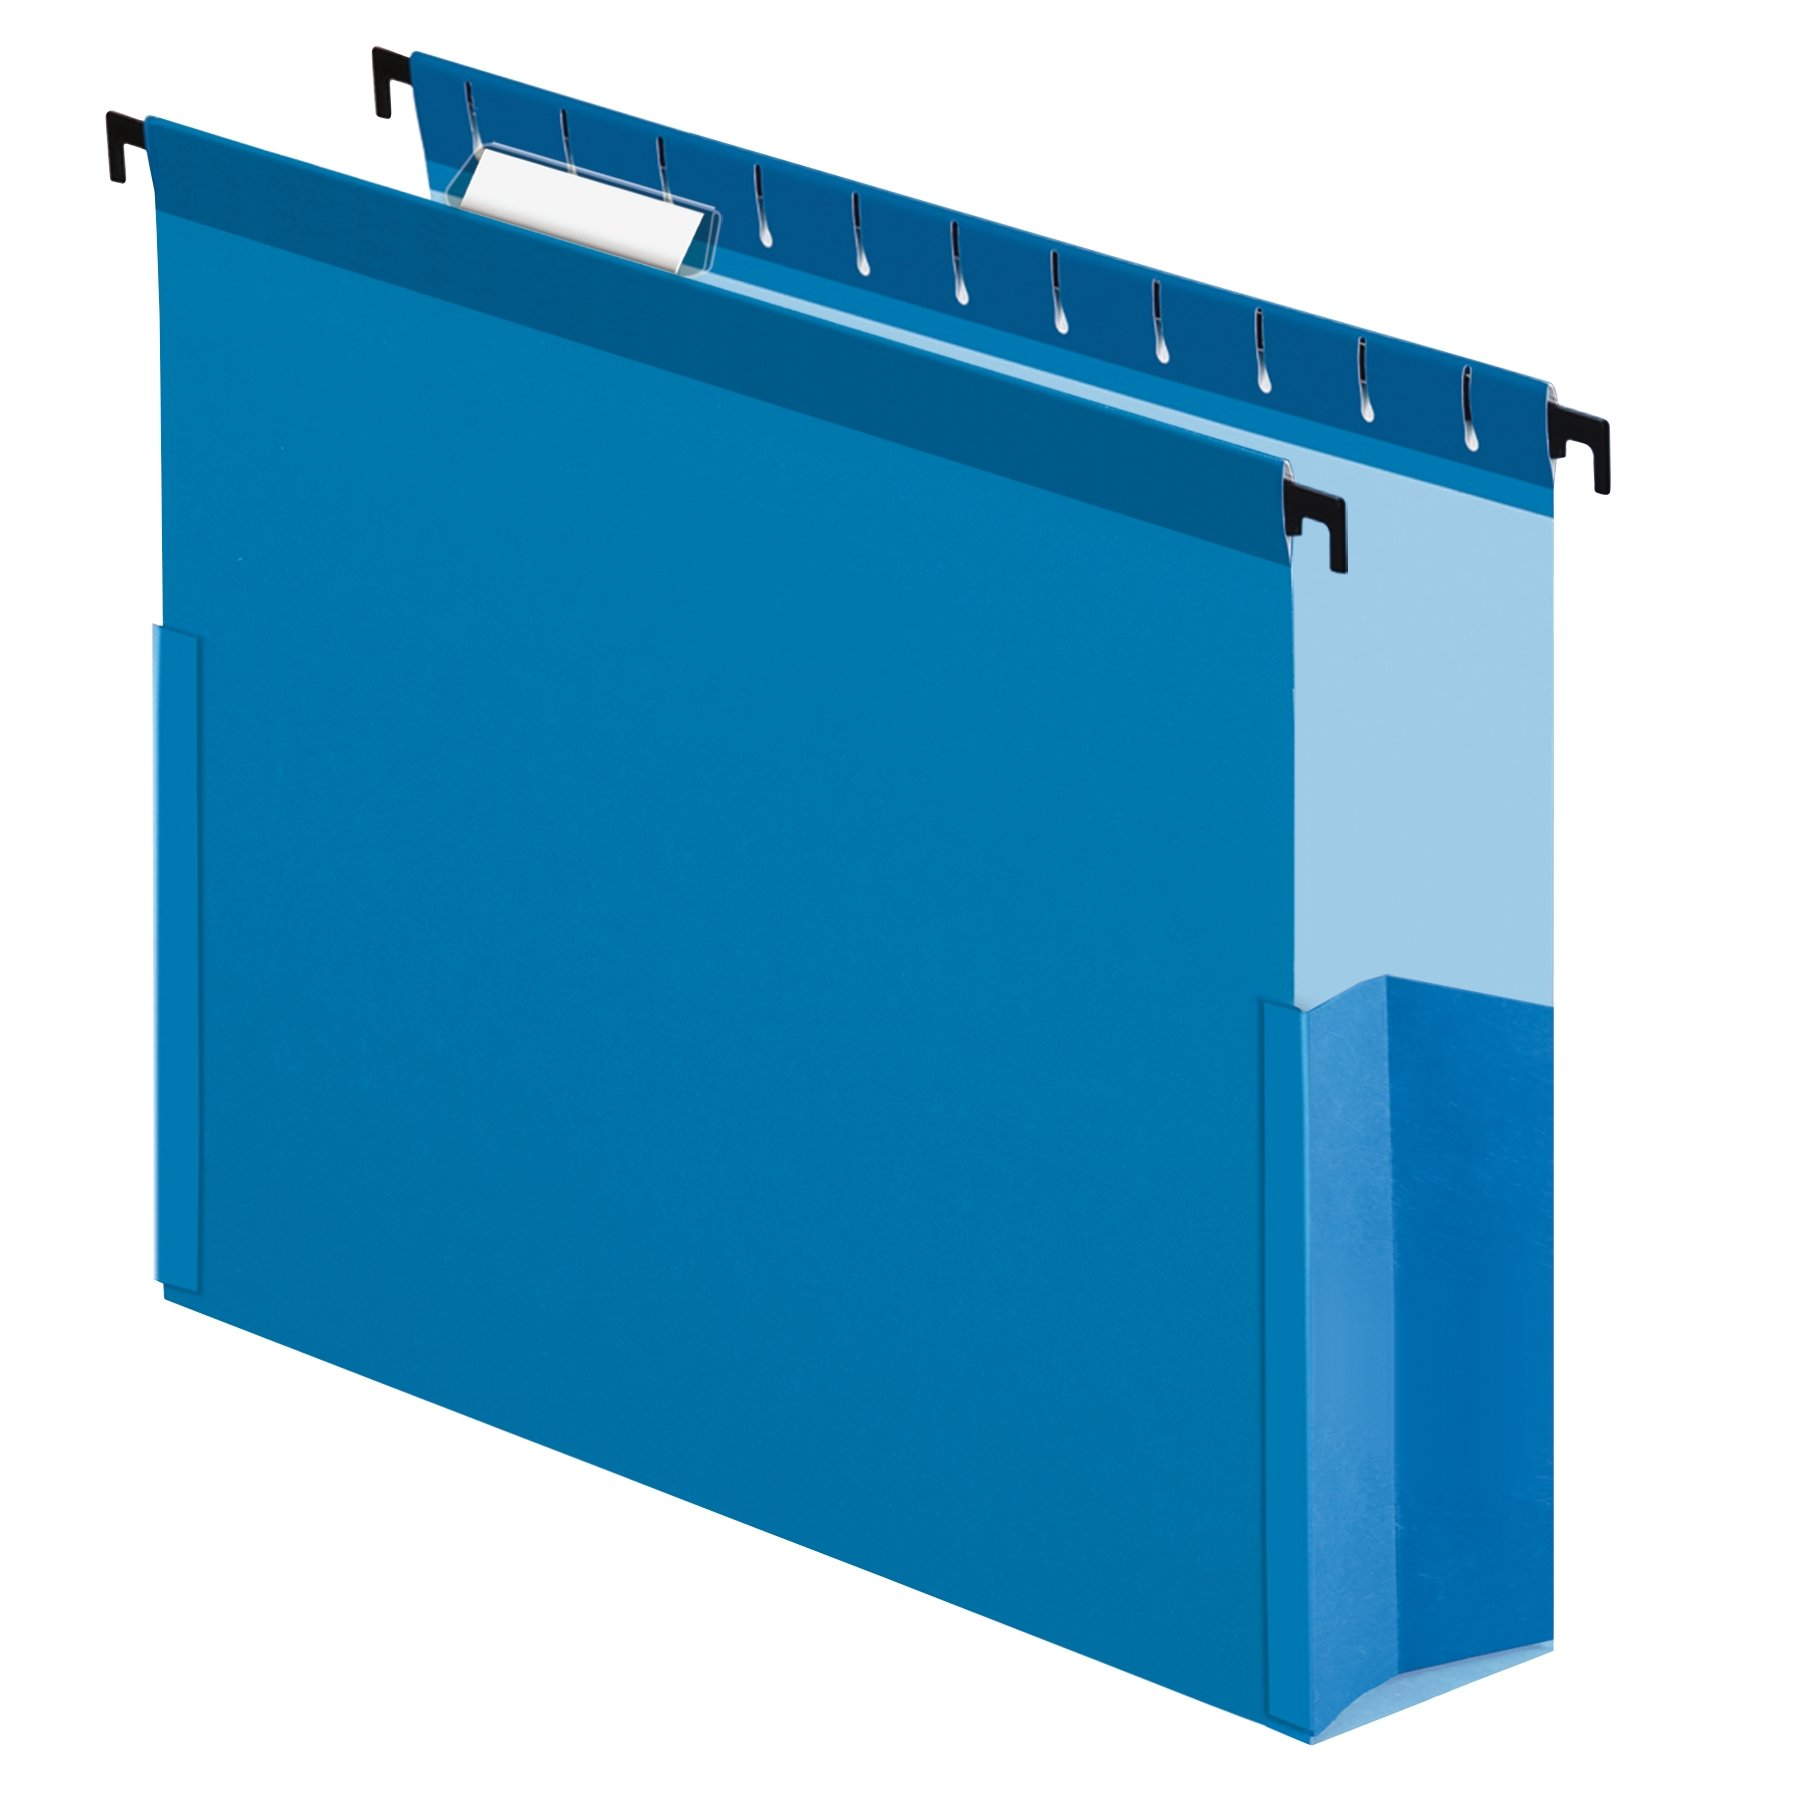 Pendaflex SureHook Reinforced Hanging Box File, 3'', Letter, Blue, 1/5 Cut, 25/BX (59203)